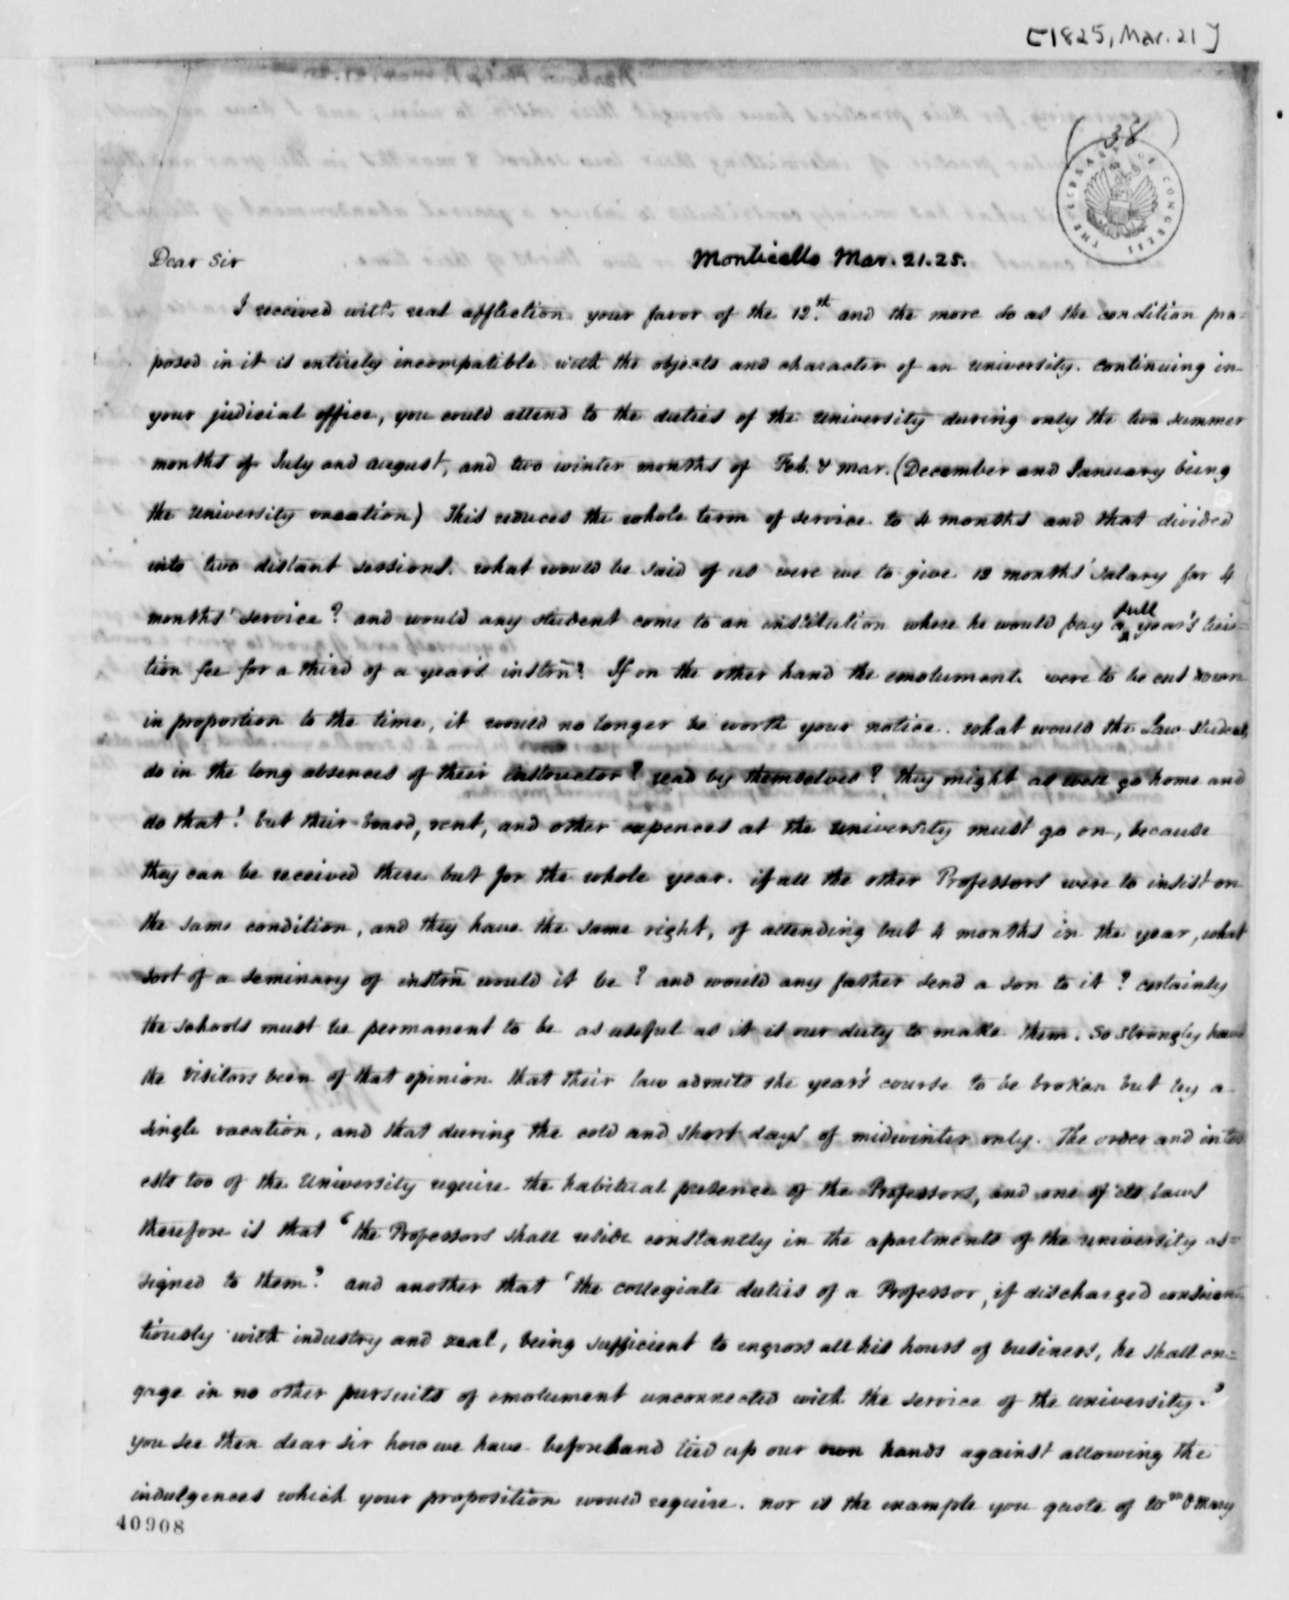 Thomas Jefferson to Philip P. Barbour, March 21, 1825